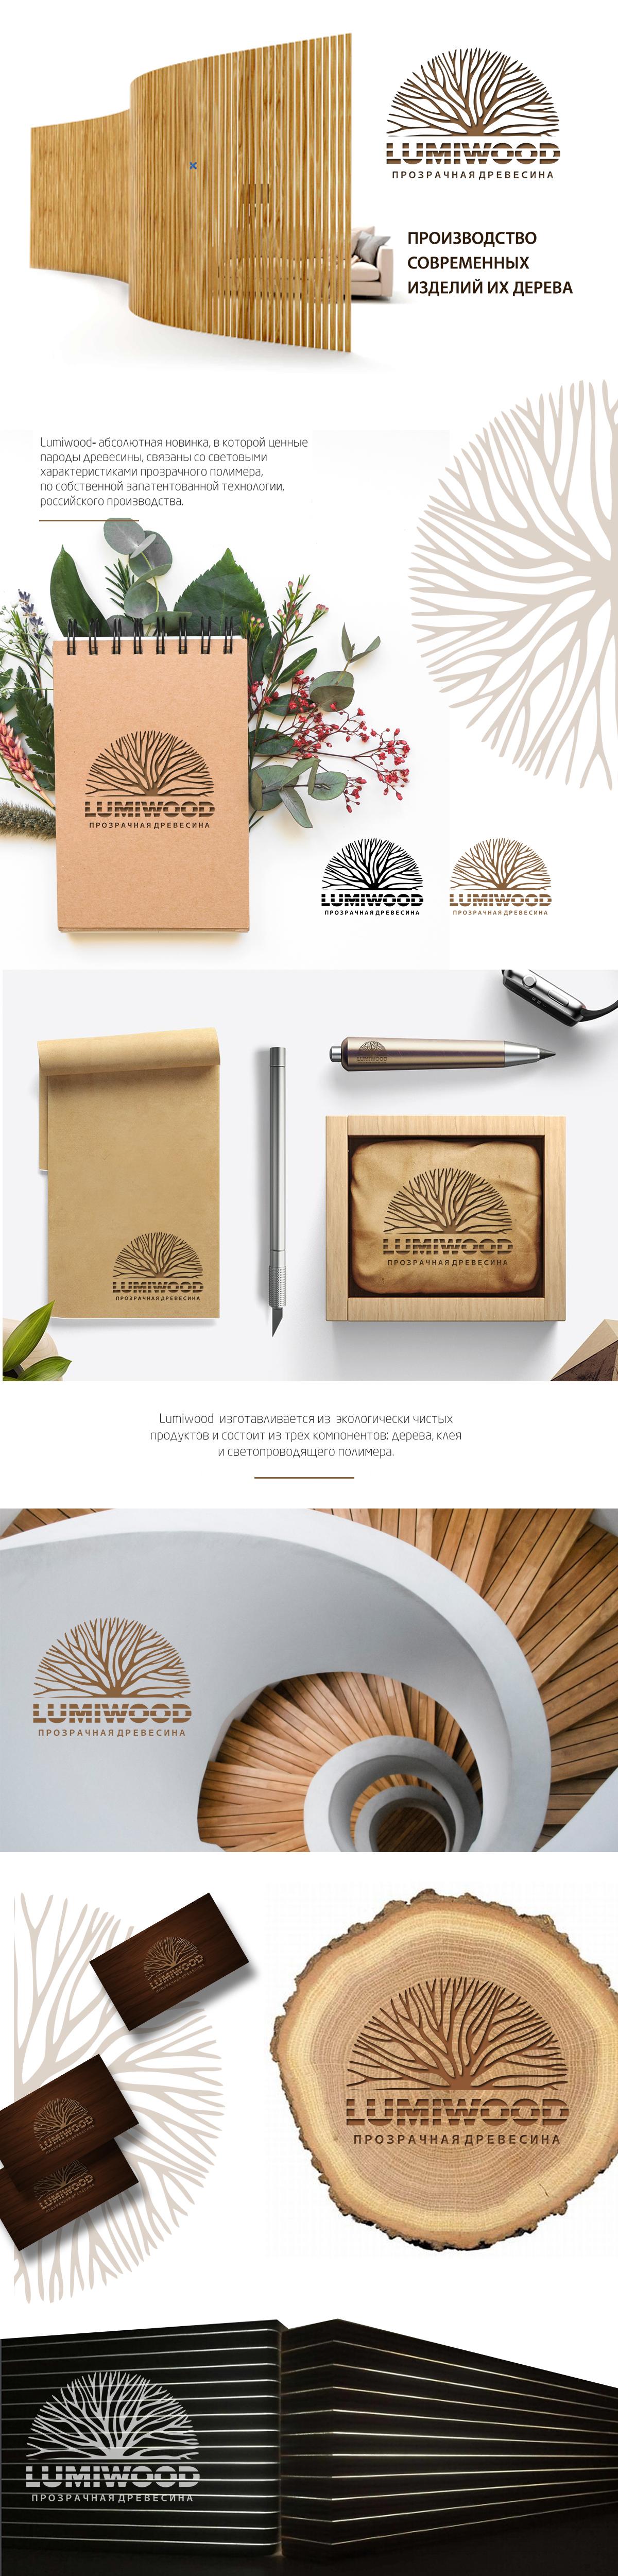 Design logo LUMIWOOD